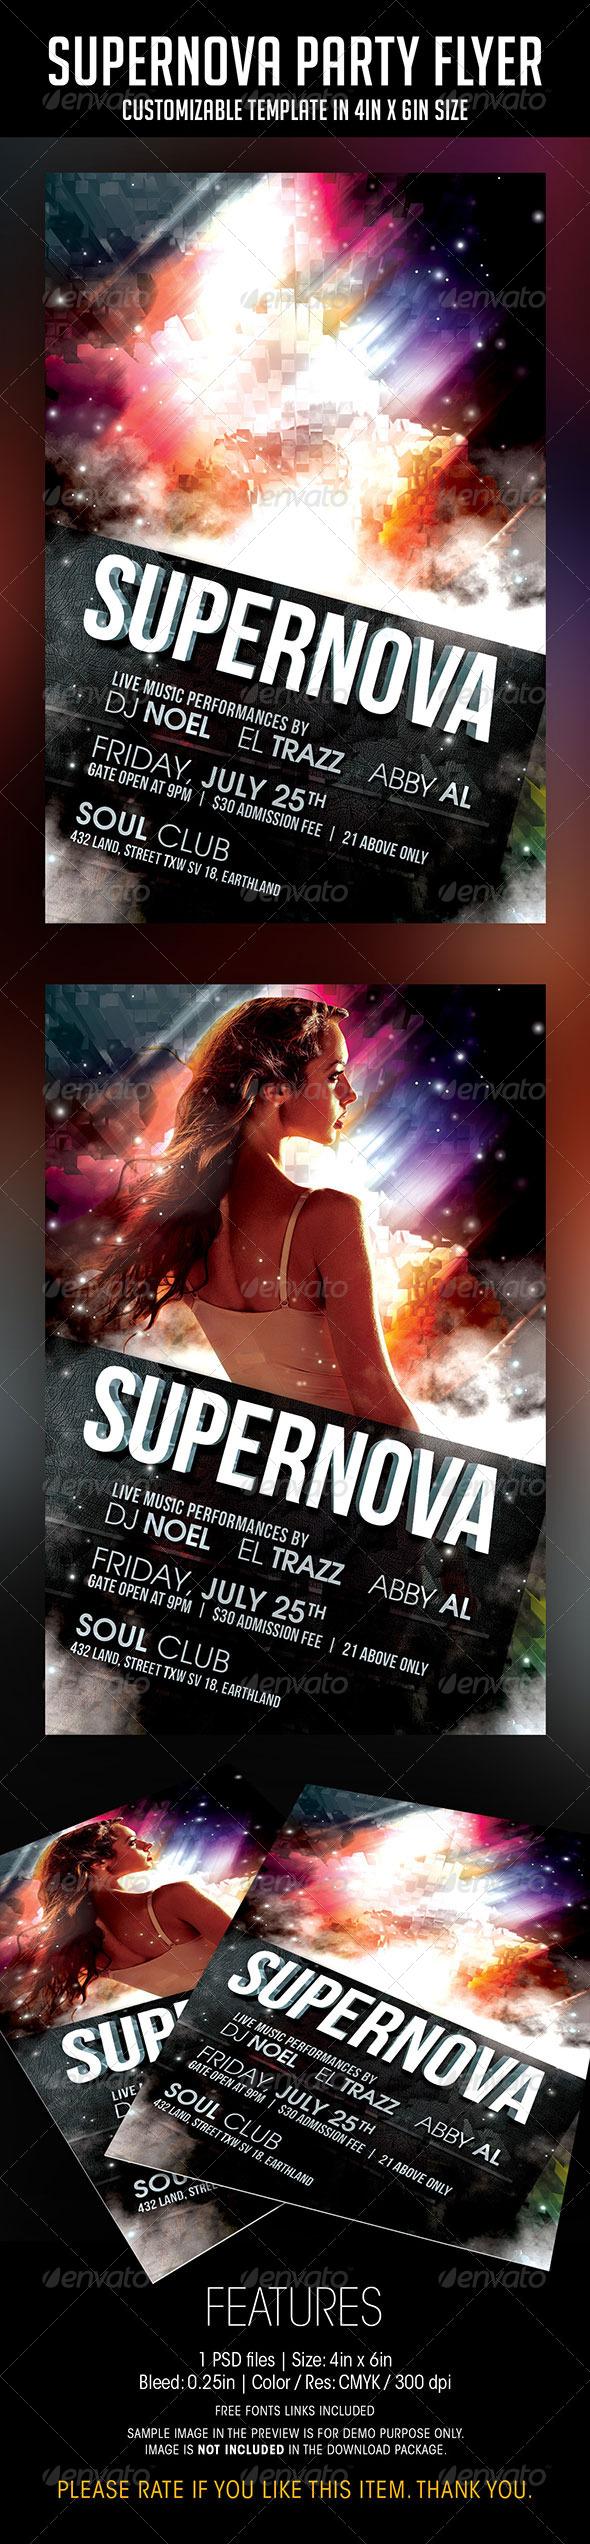 GraphicRiver Supernova Party Flyer 7499517